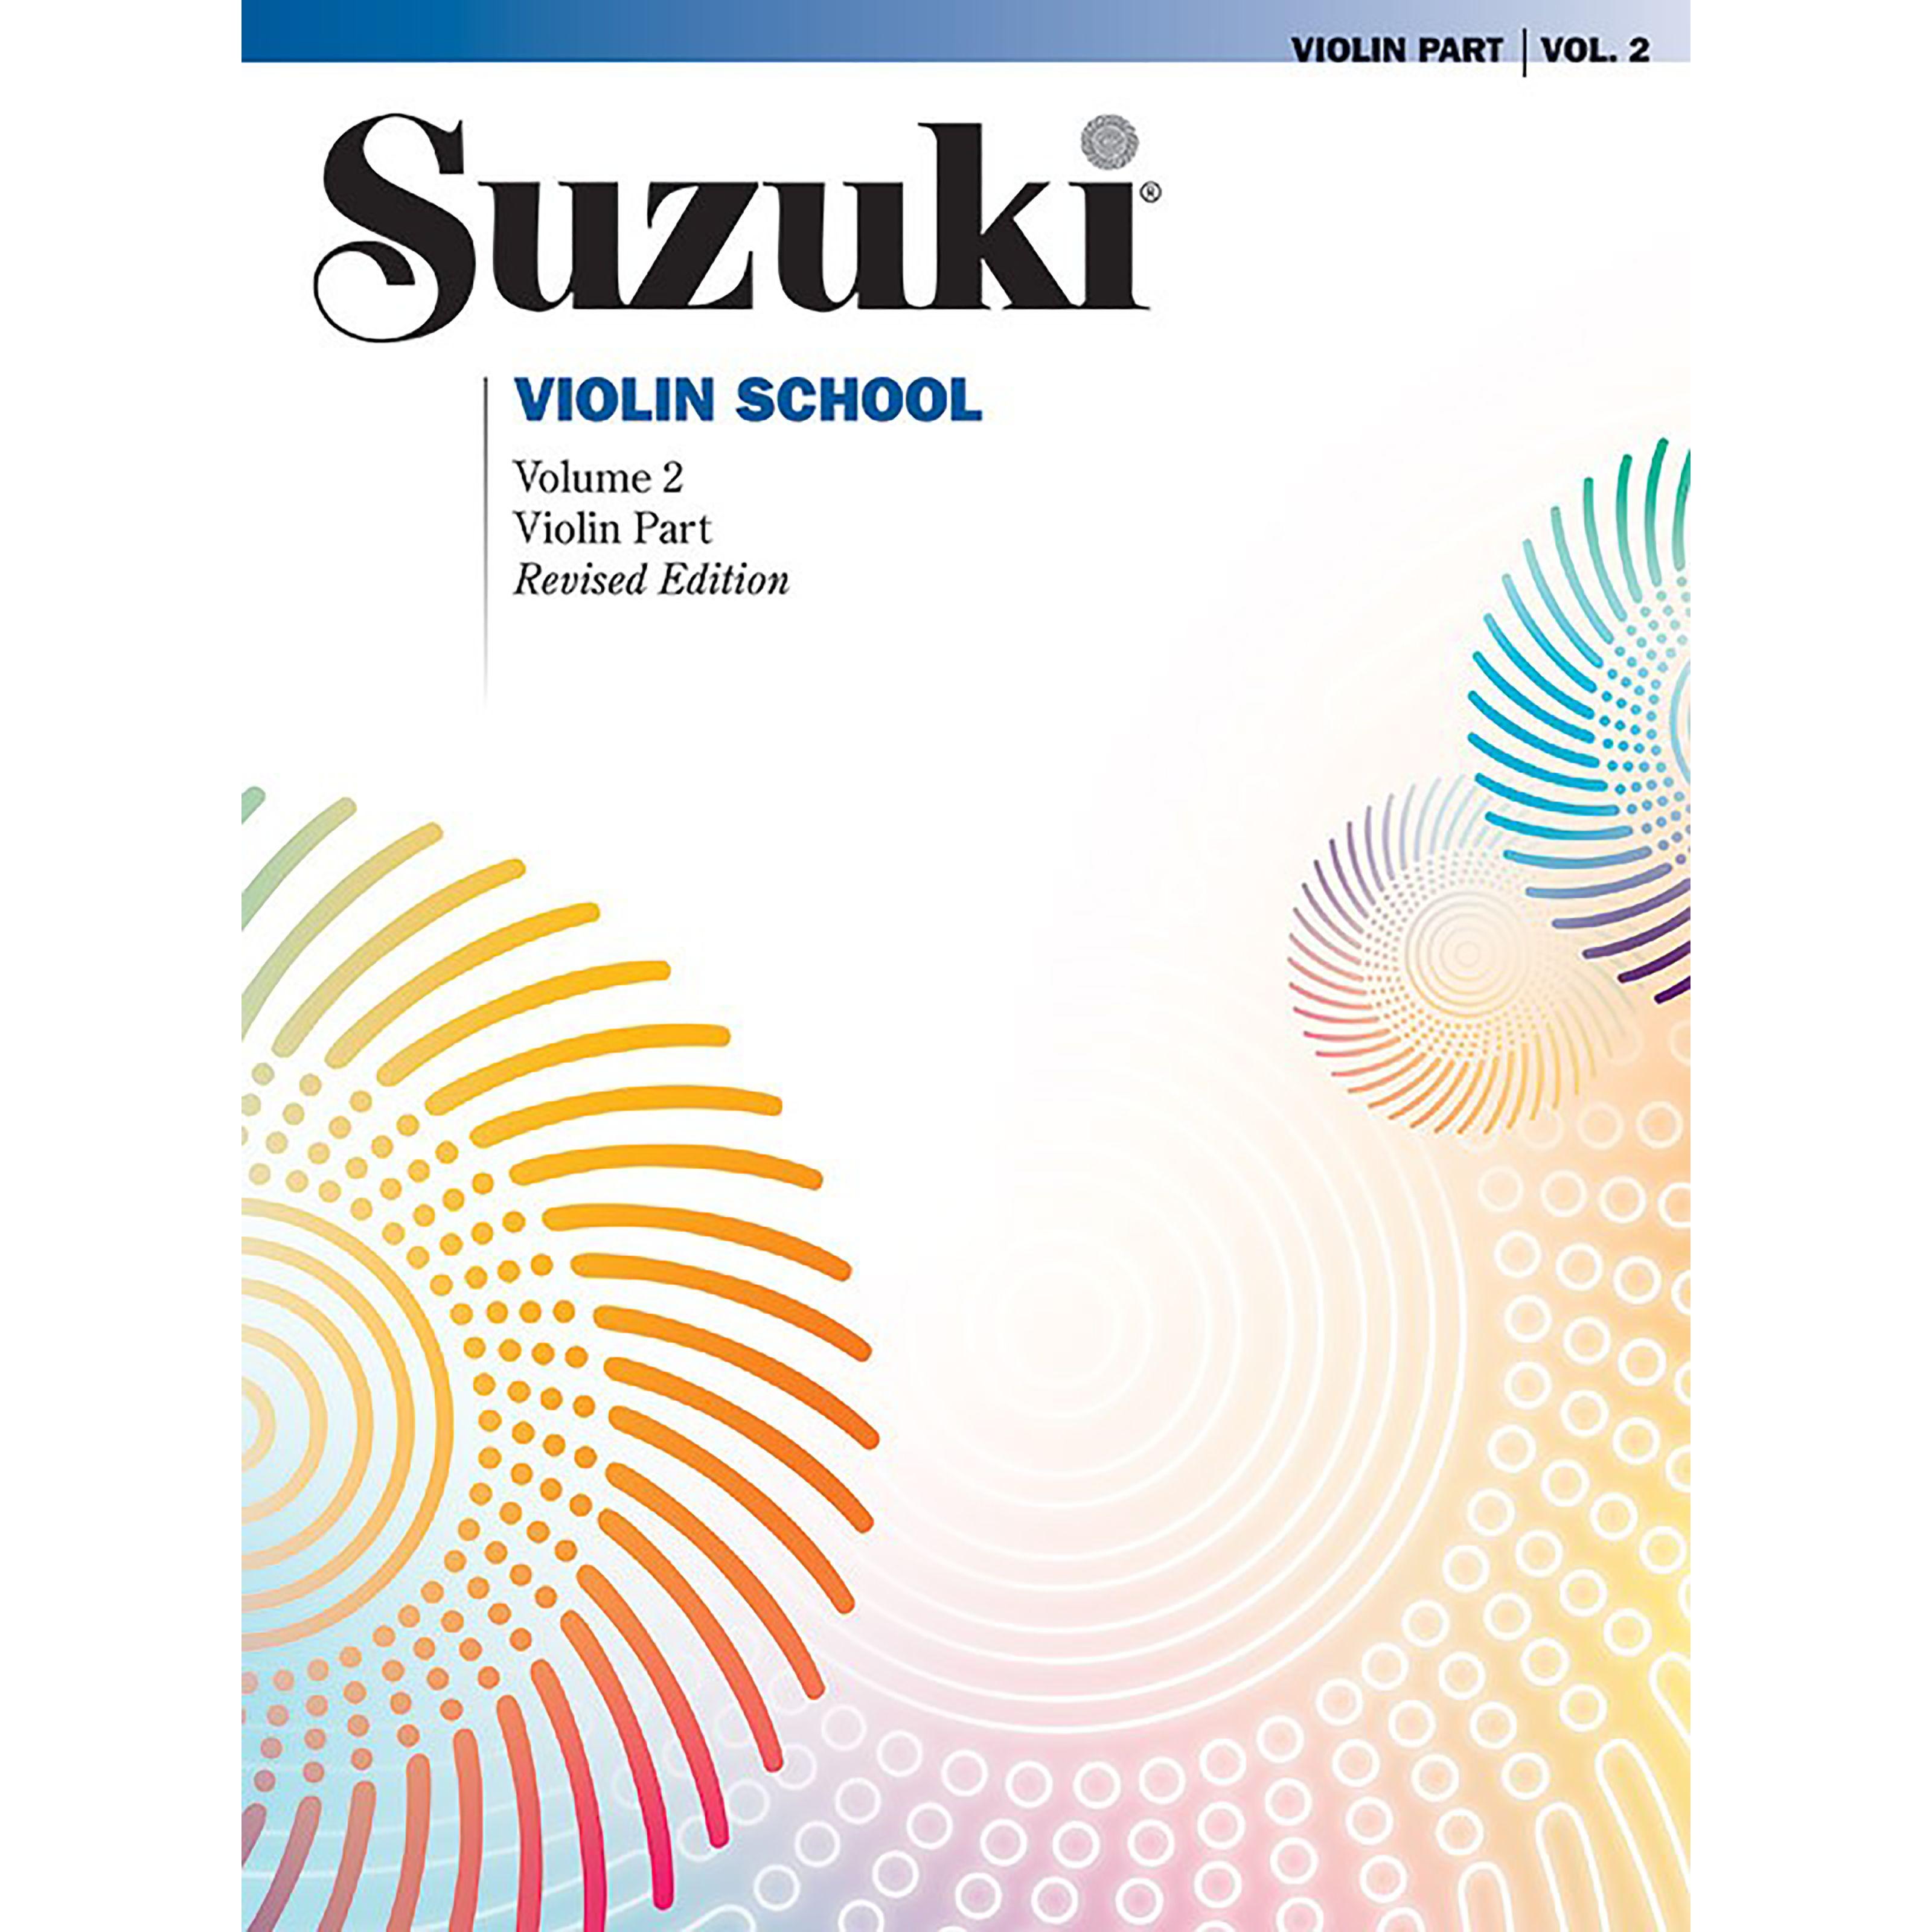 Alfred Music - Suzuki Violin School 2 00-0146S